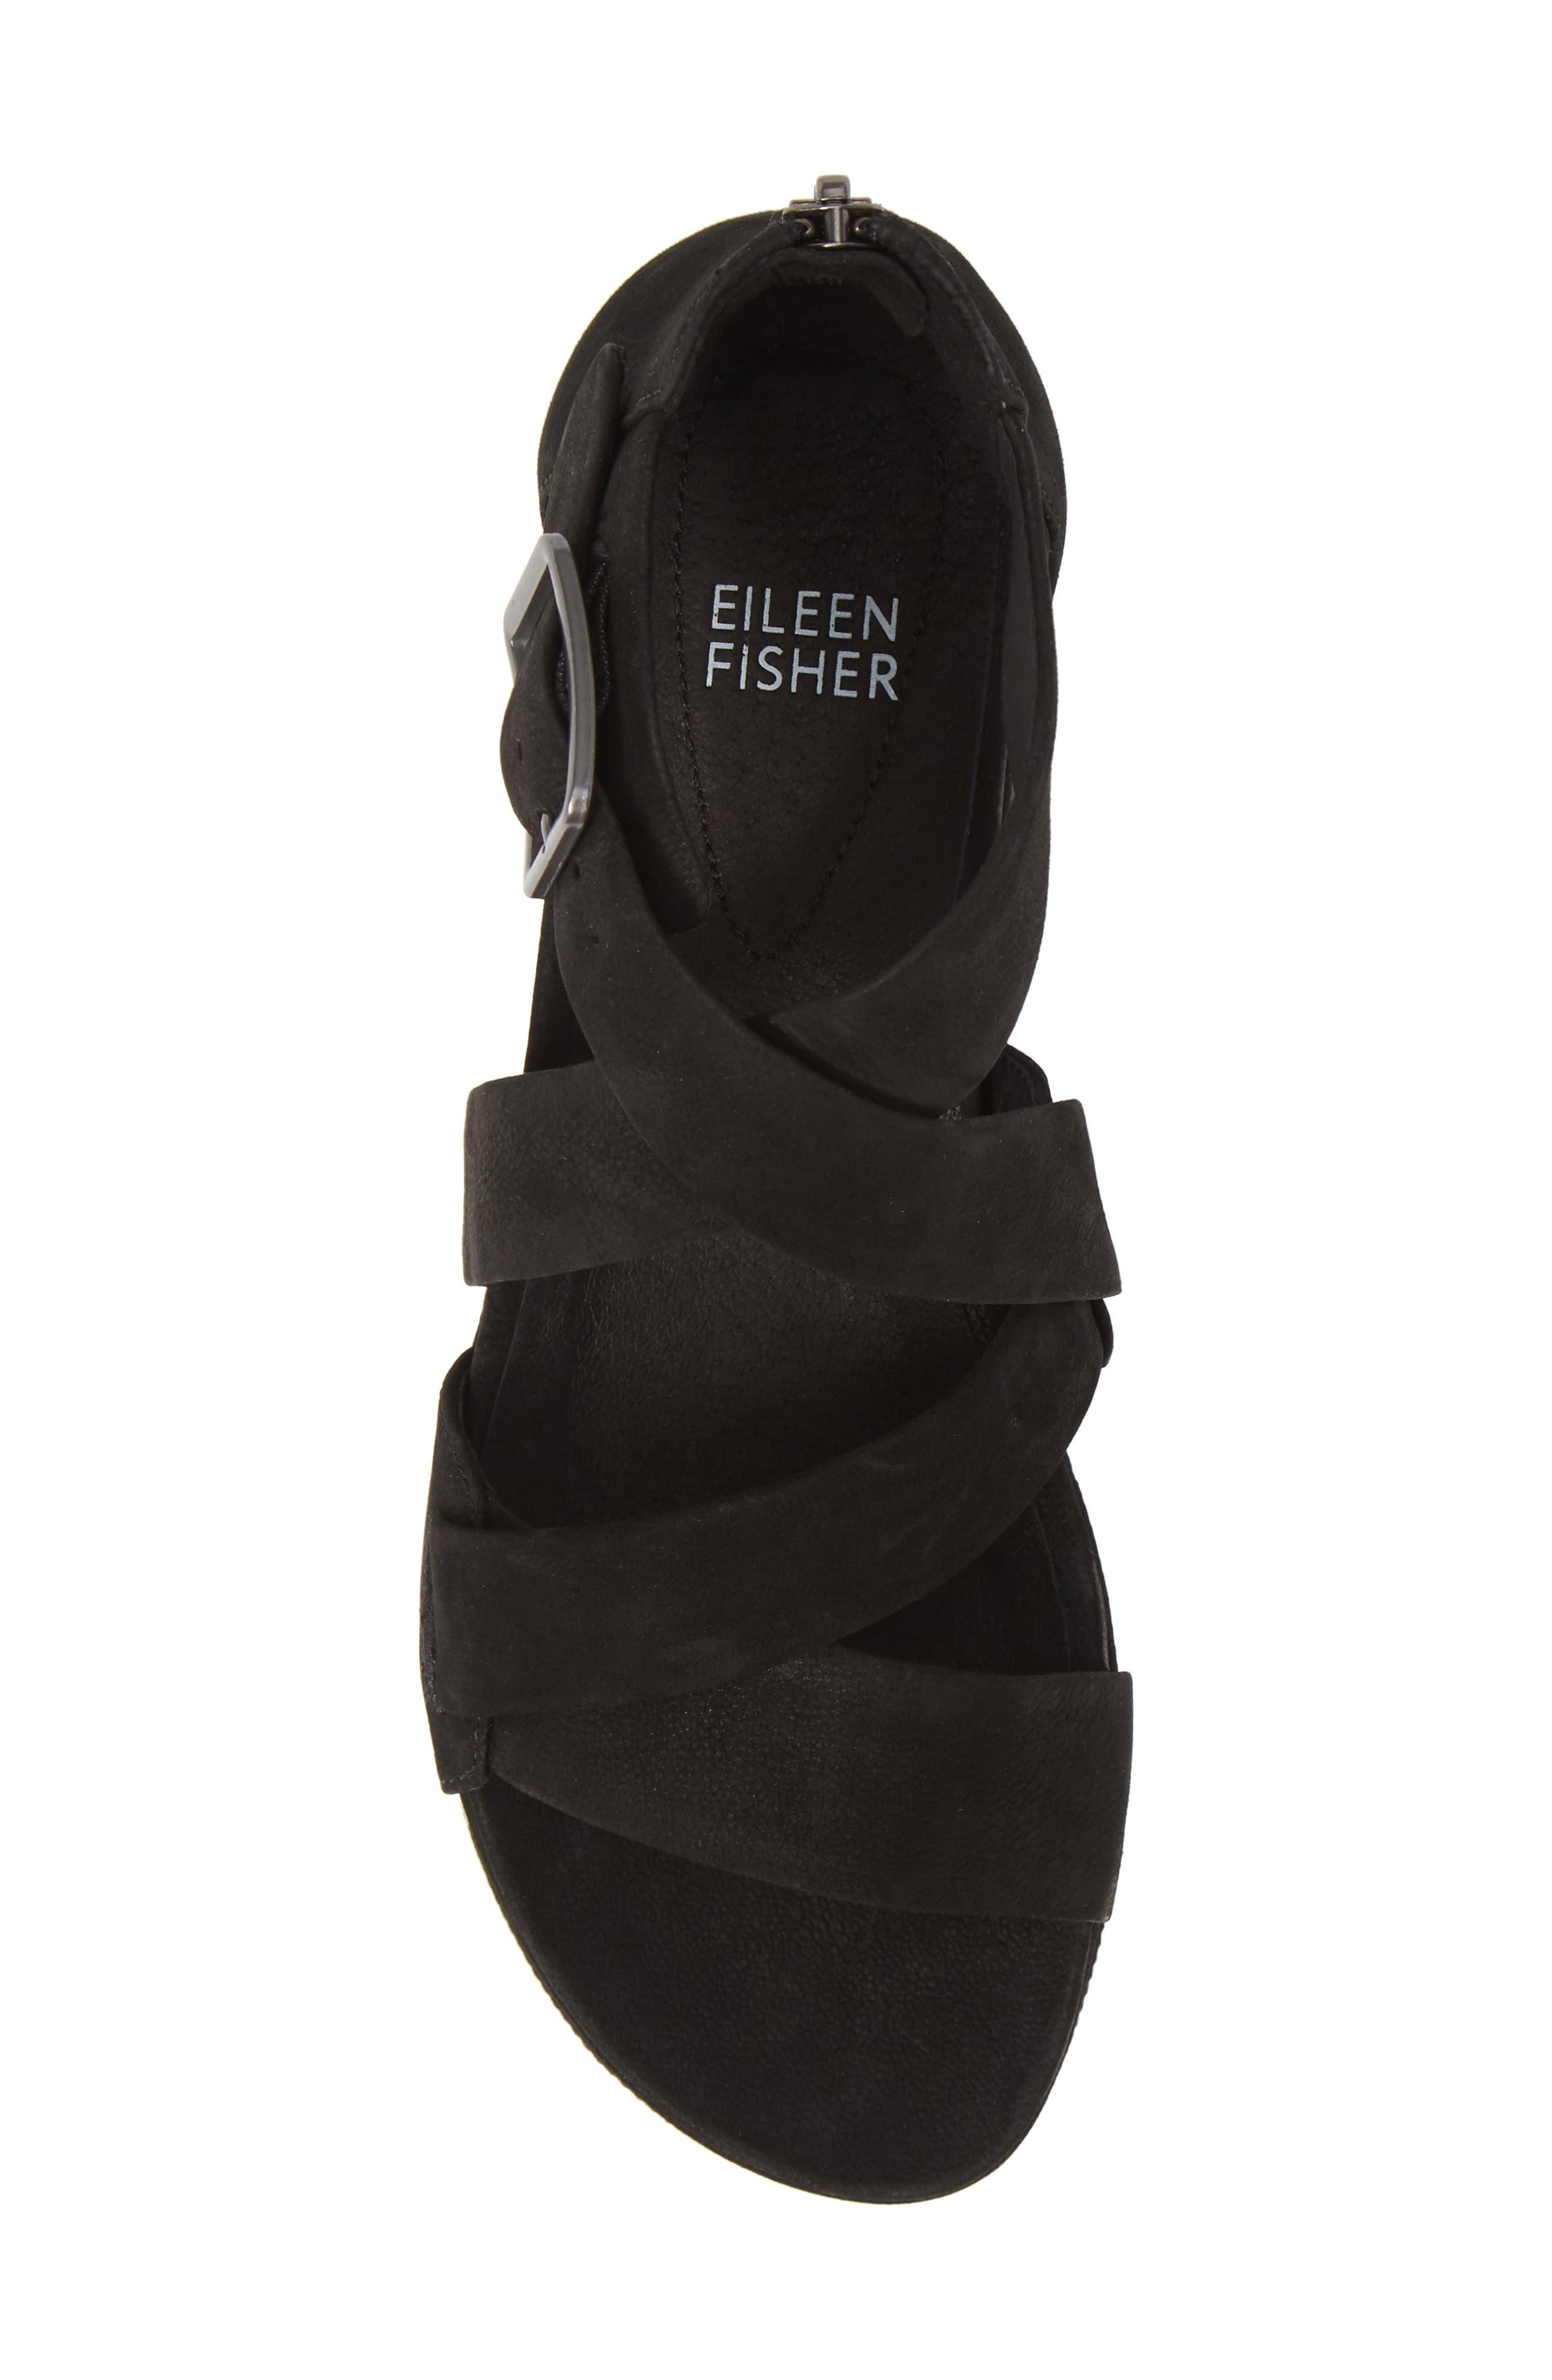 EILEEN FISHER, Boost Wedge Sandal, Alternate thumbnail 5, color, BLACK NUBUCK